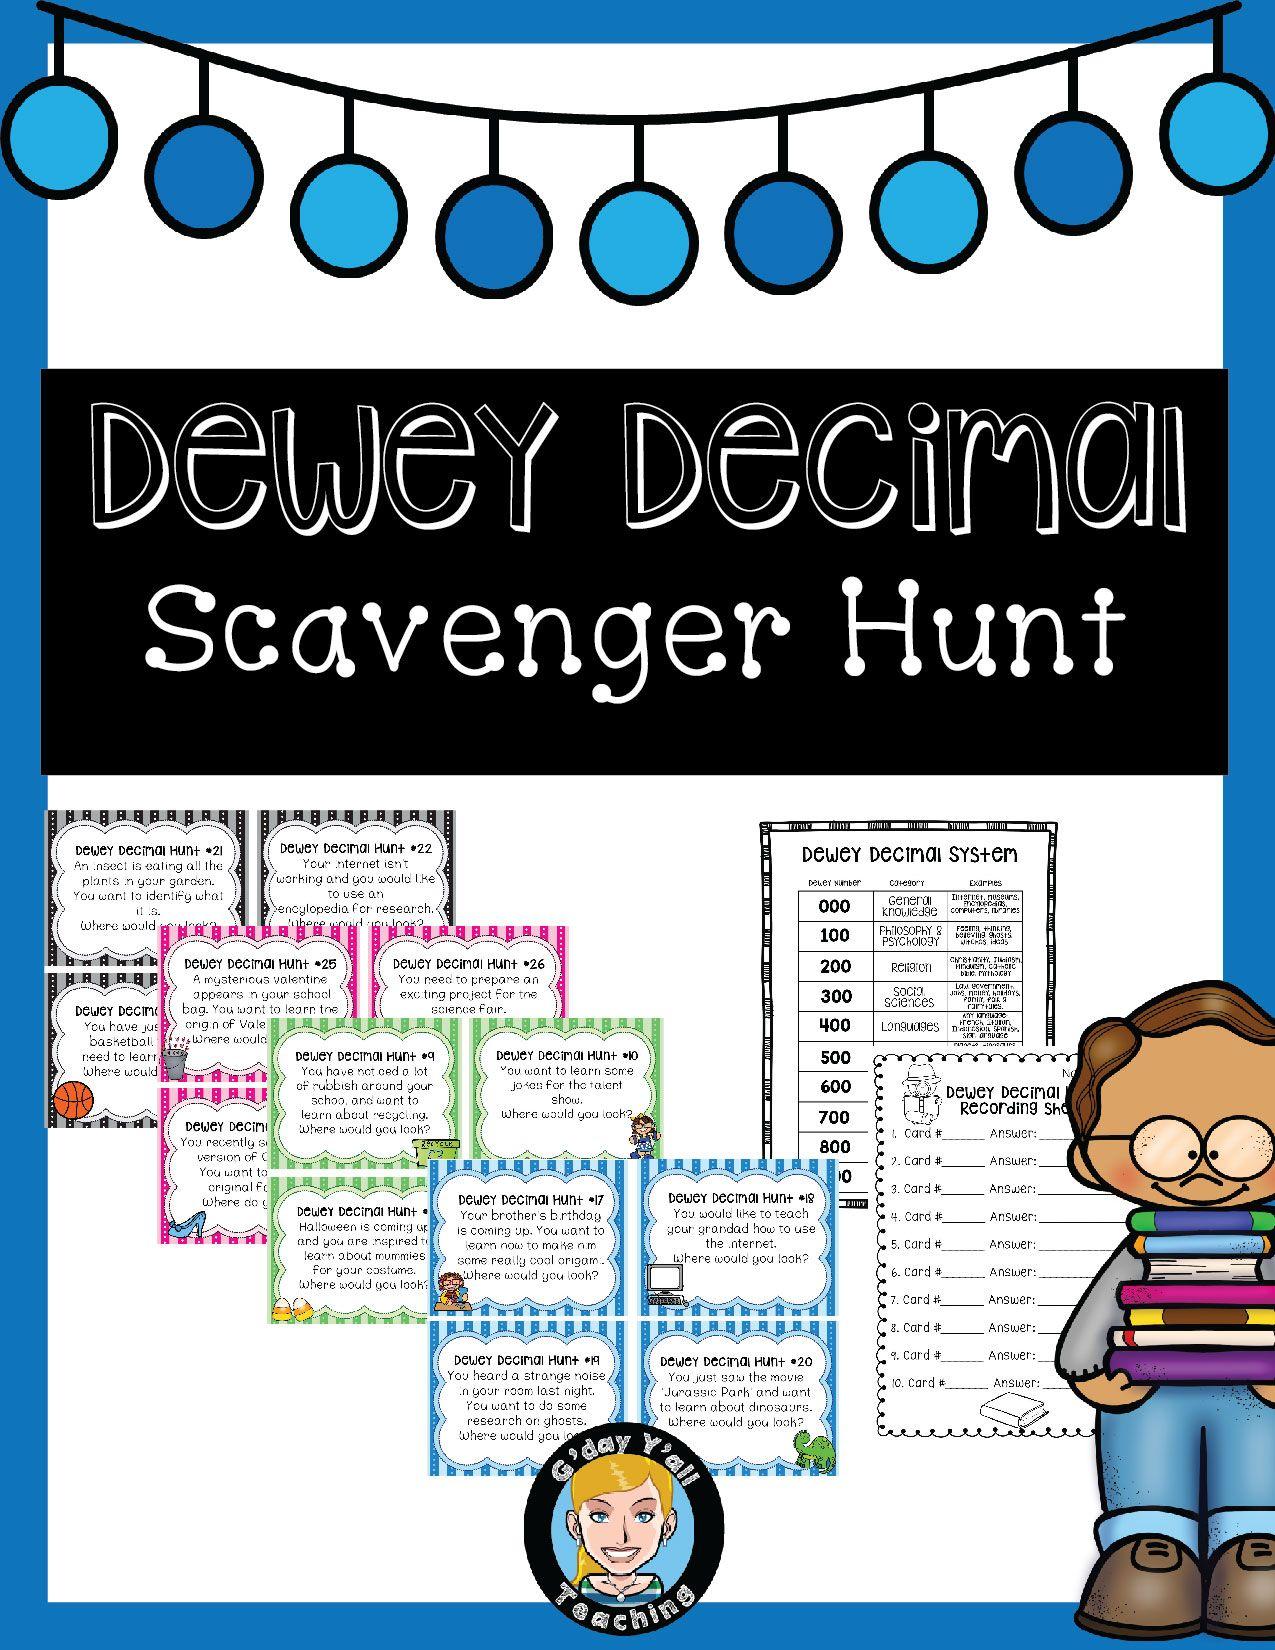 Dewey Decimal Scavenger Hunt An Engaging Way To Teach